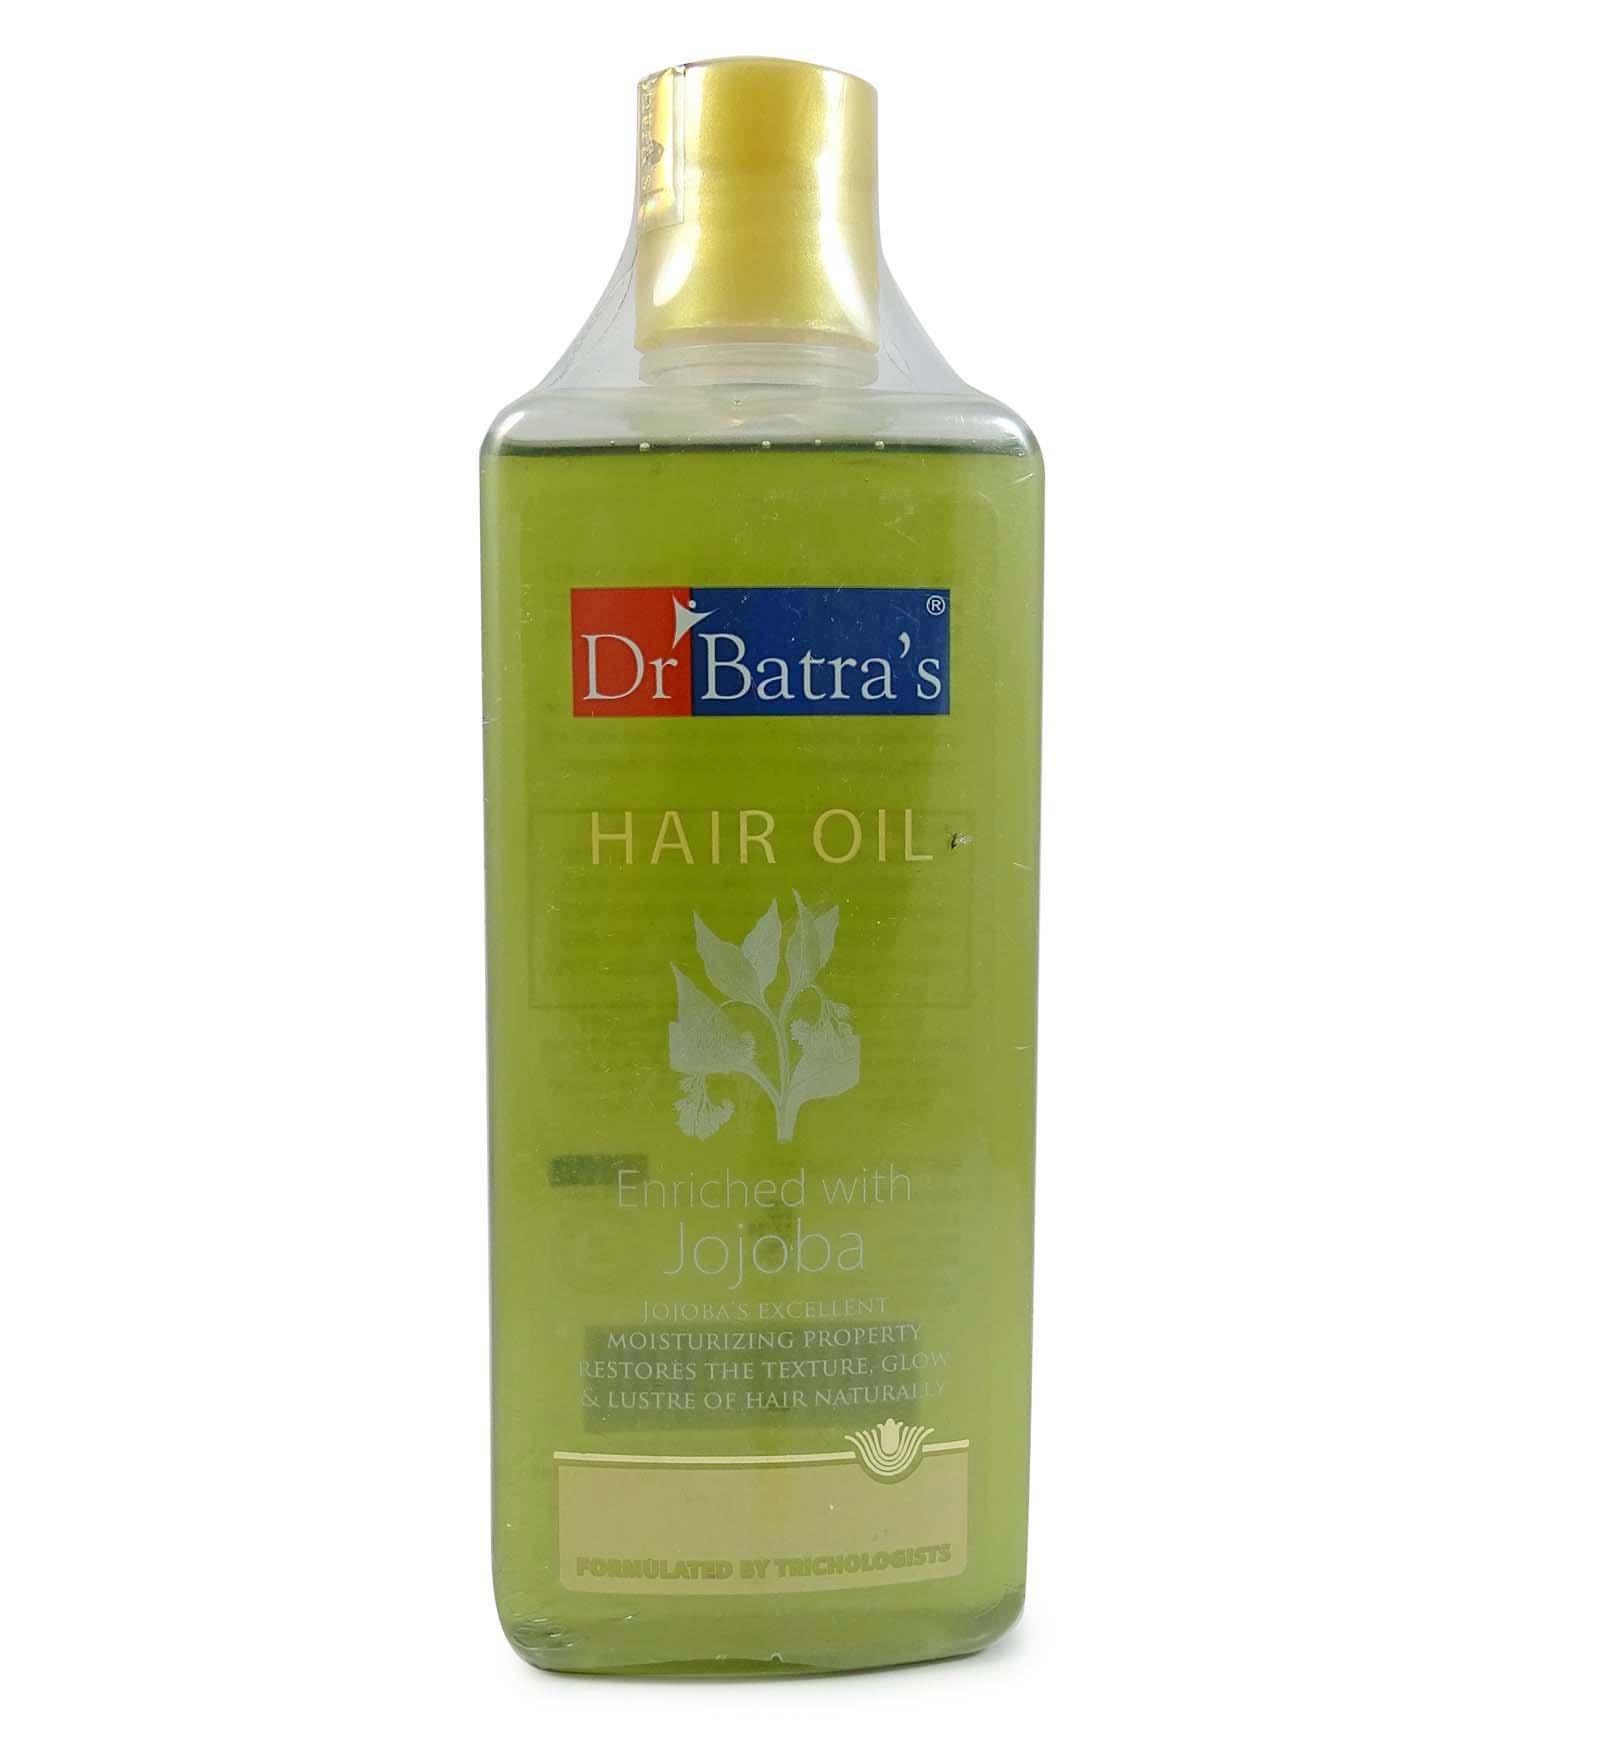 Amazon.com: Dr Batra's Dandruff Cleansing Shampoo Enriched